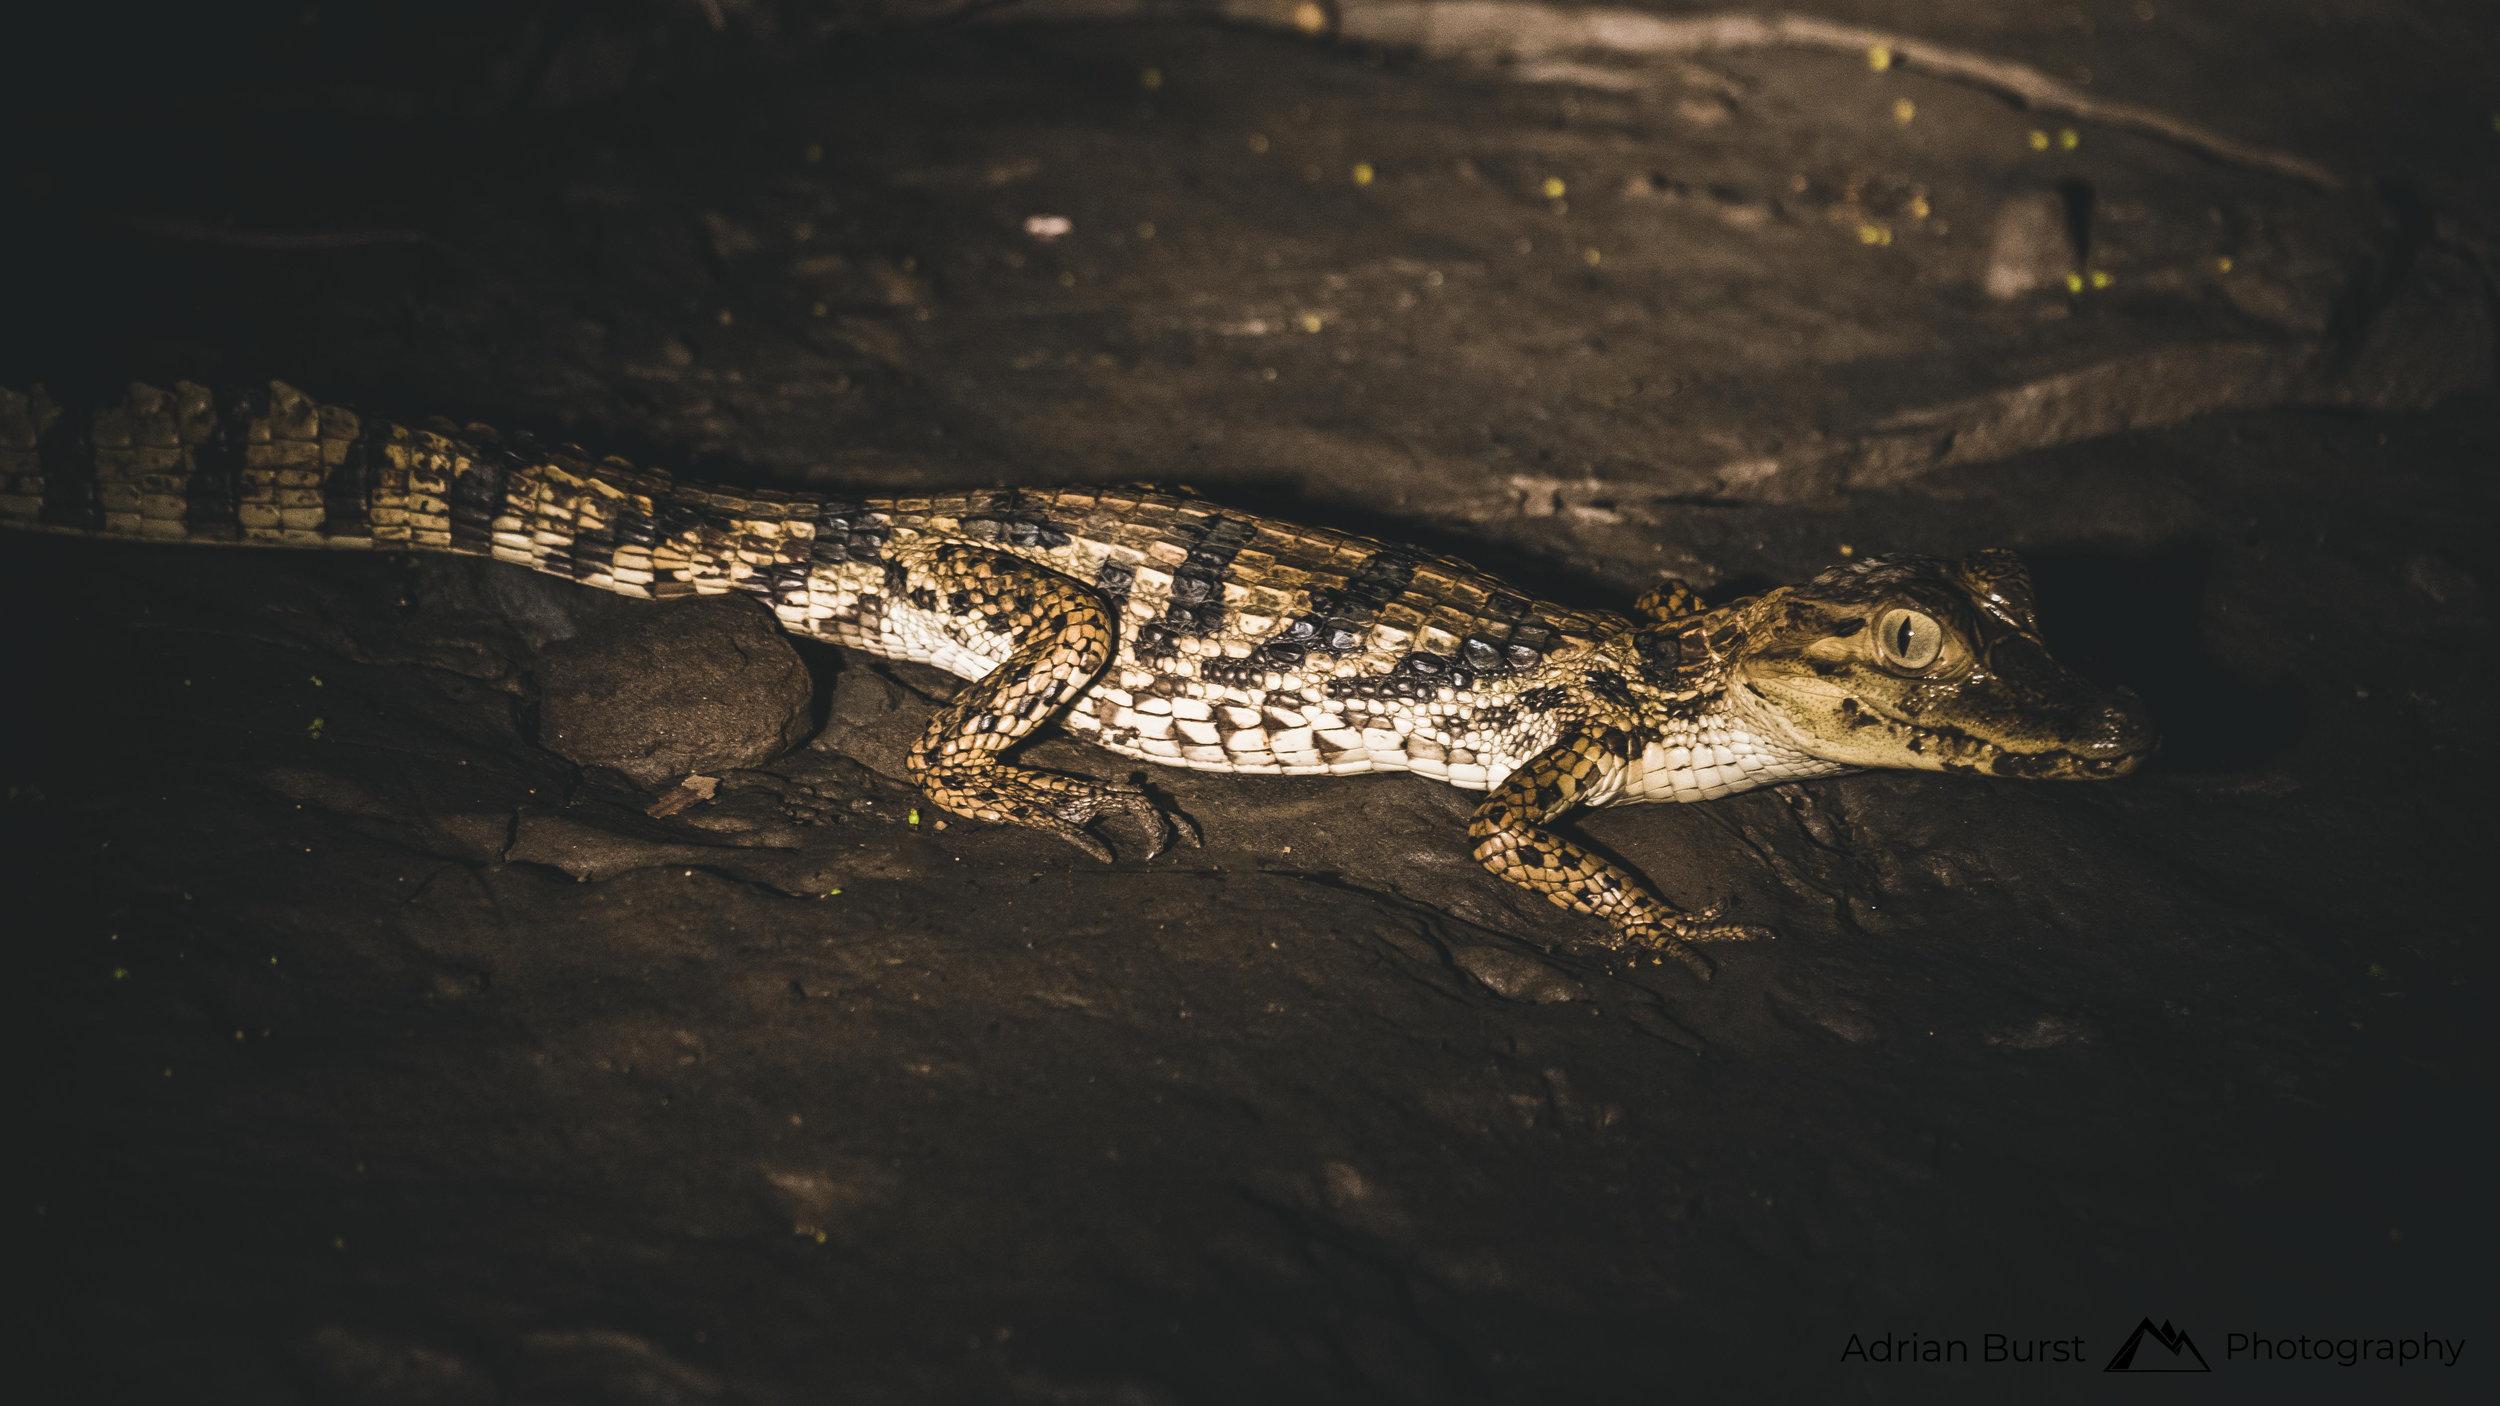 145 | Black caiman, Tambopata national reserve